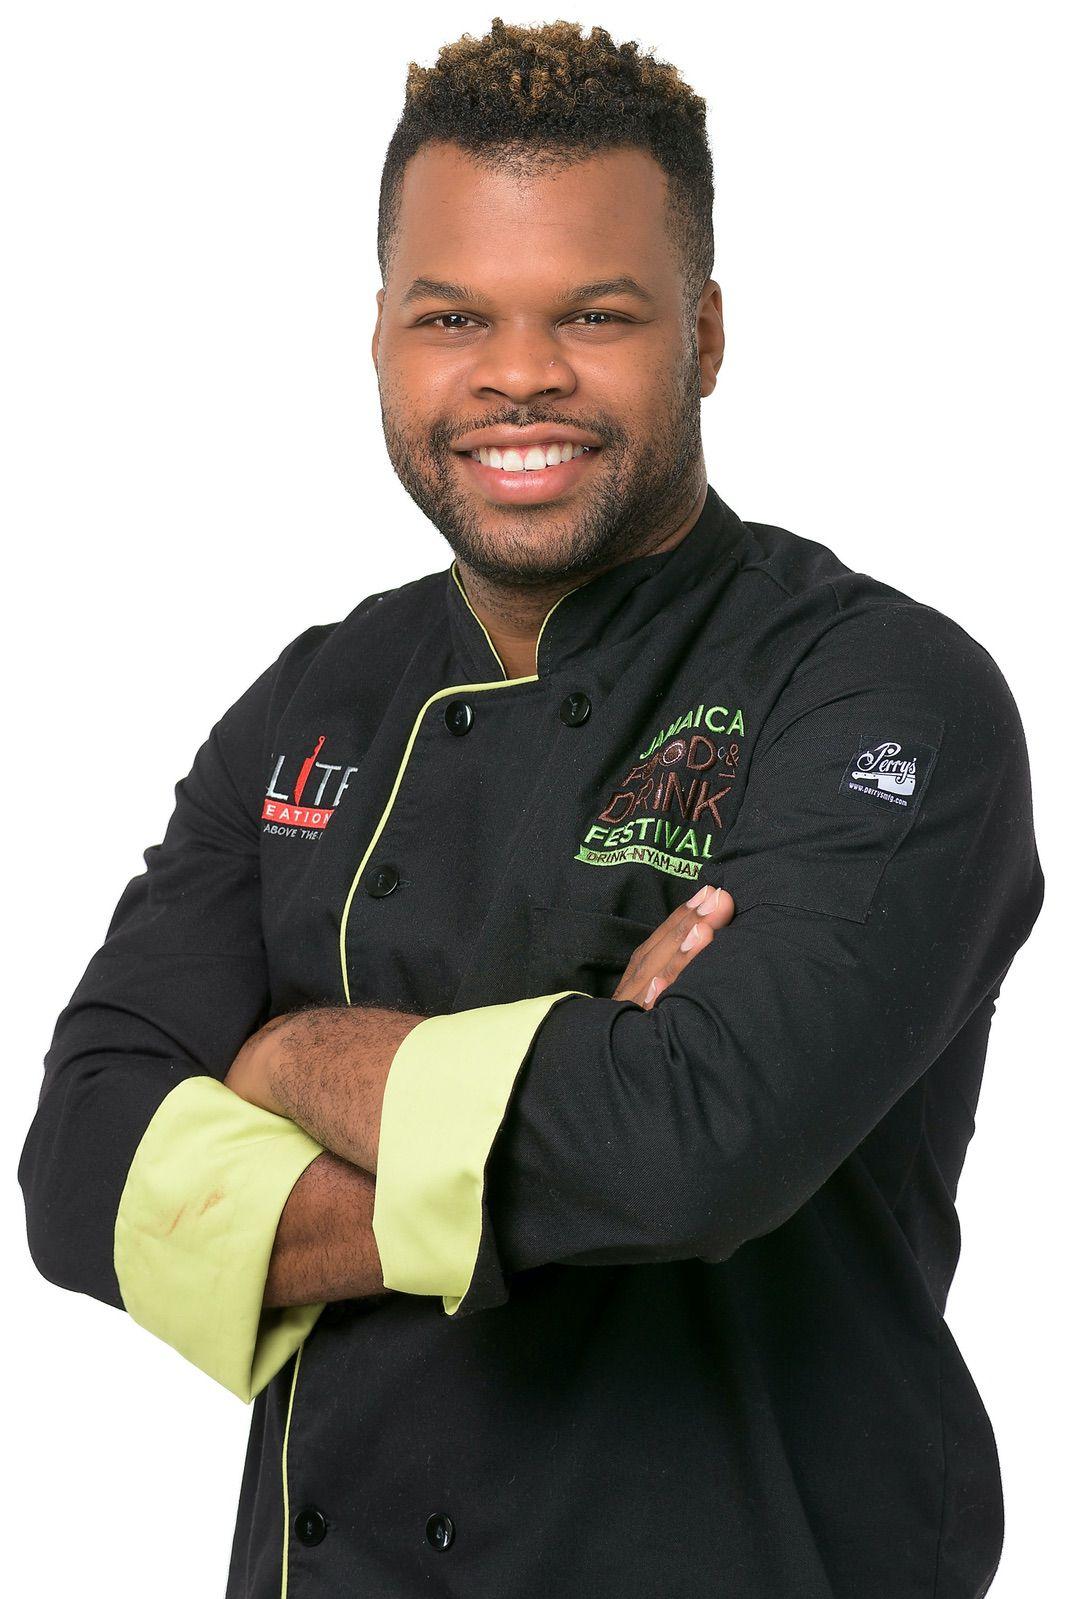 Jamaica Food & Drink Festival Chef Portraits Shoot 2 Edits-6456.jpg